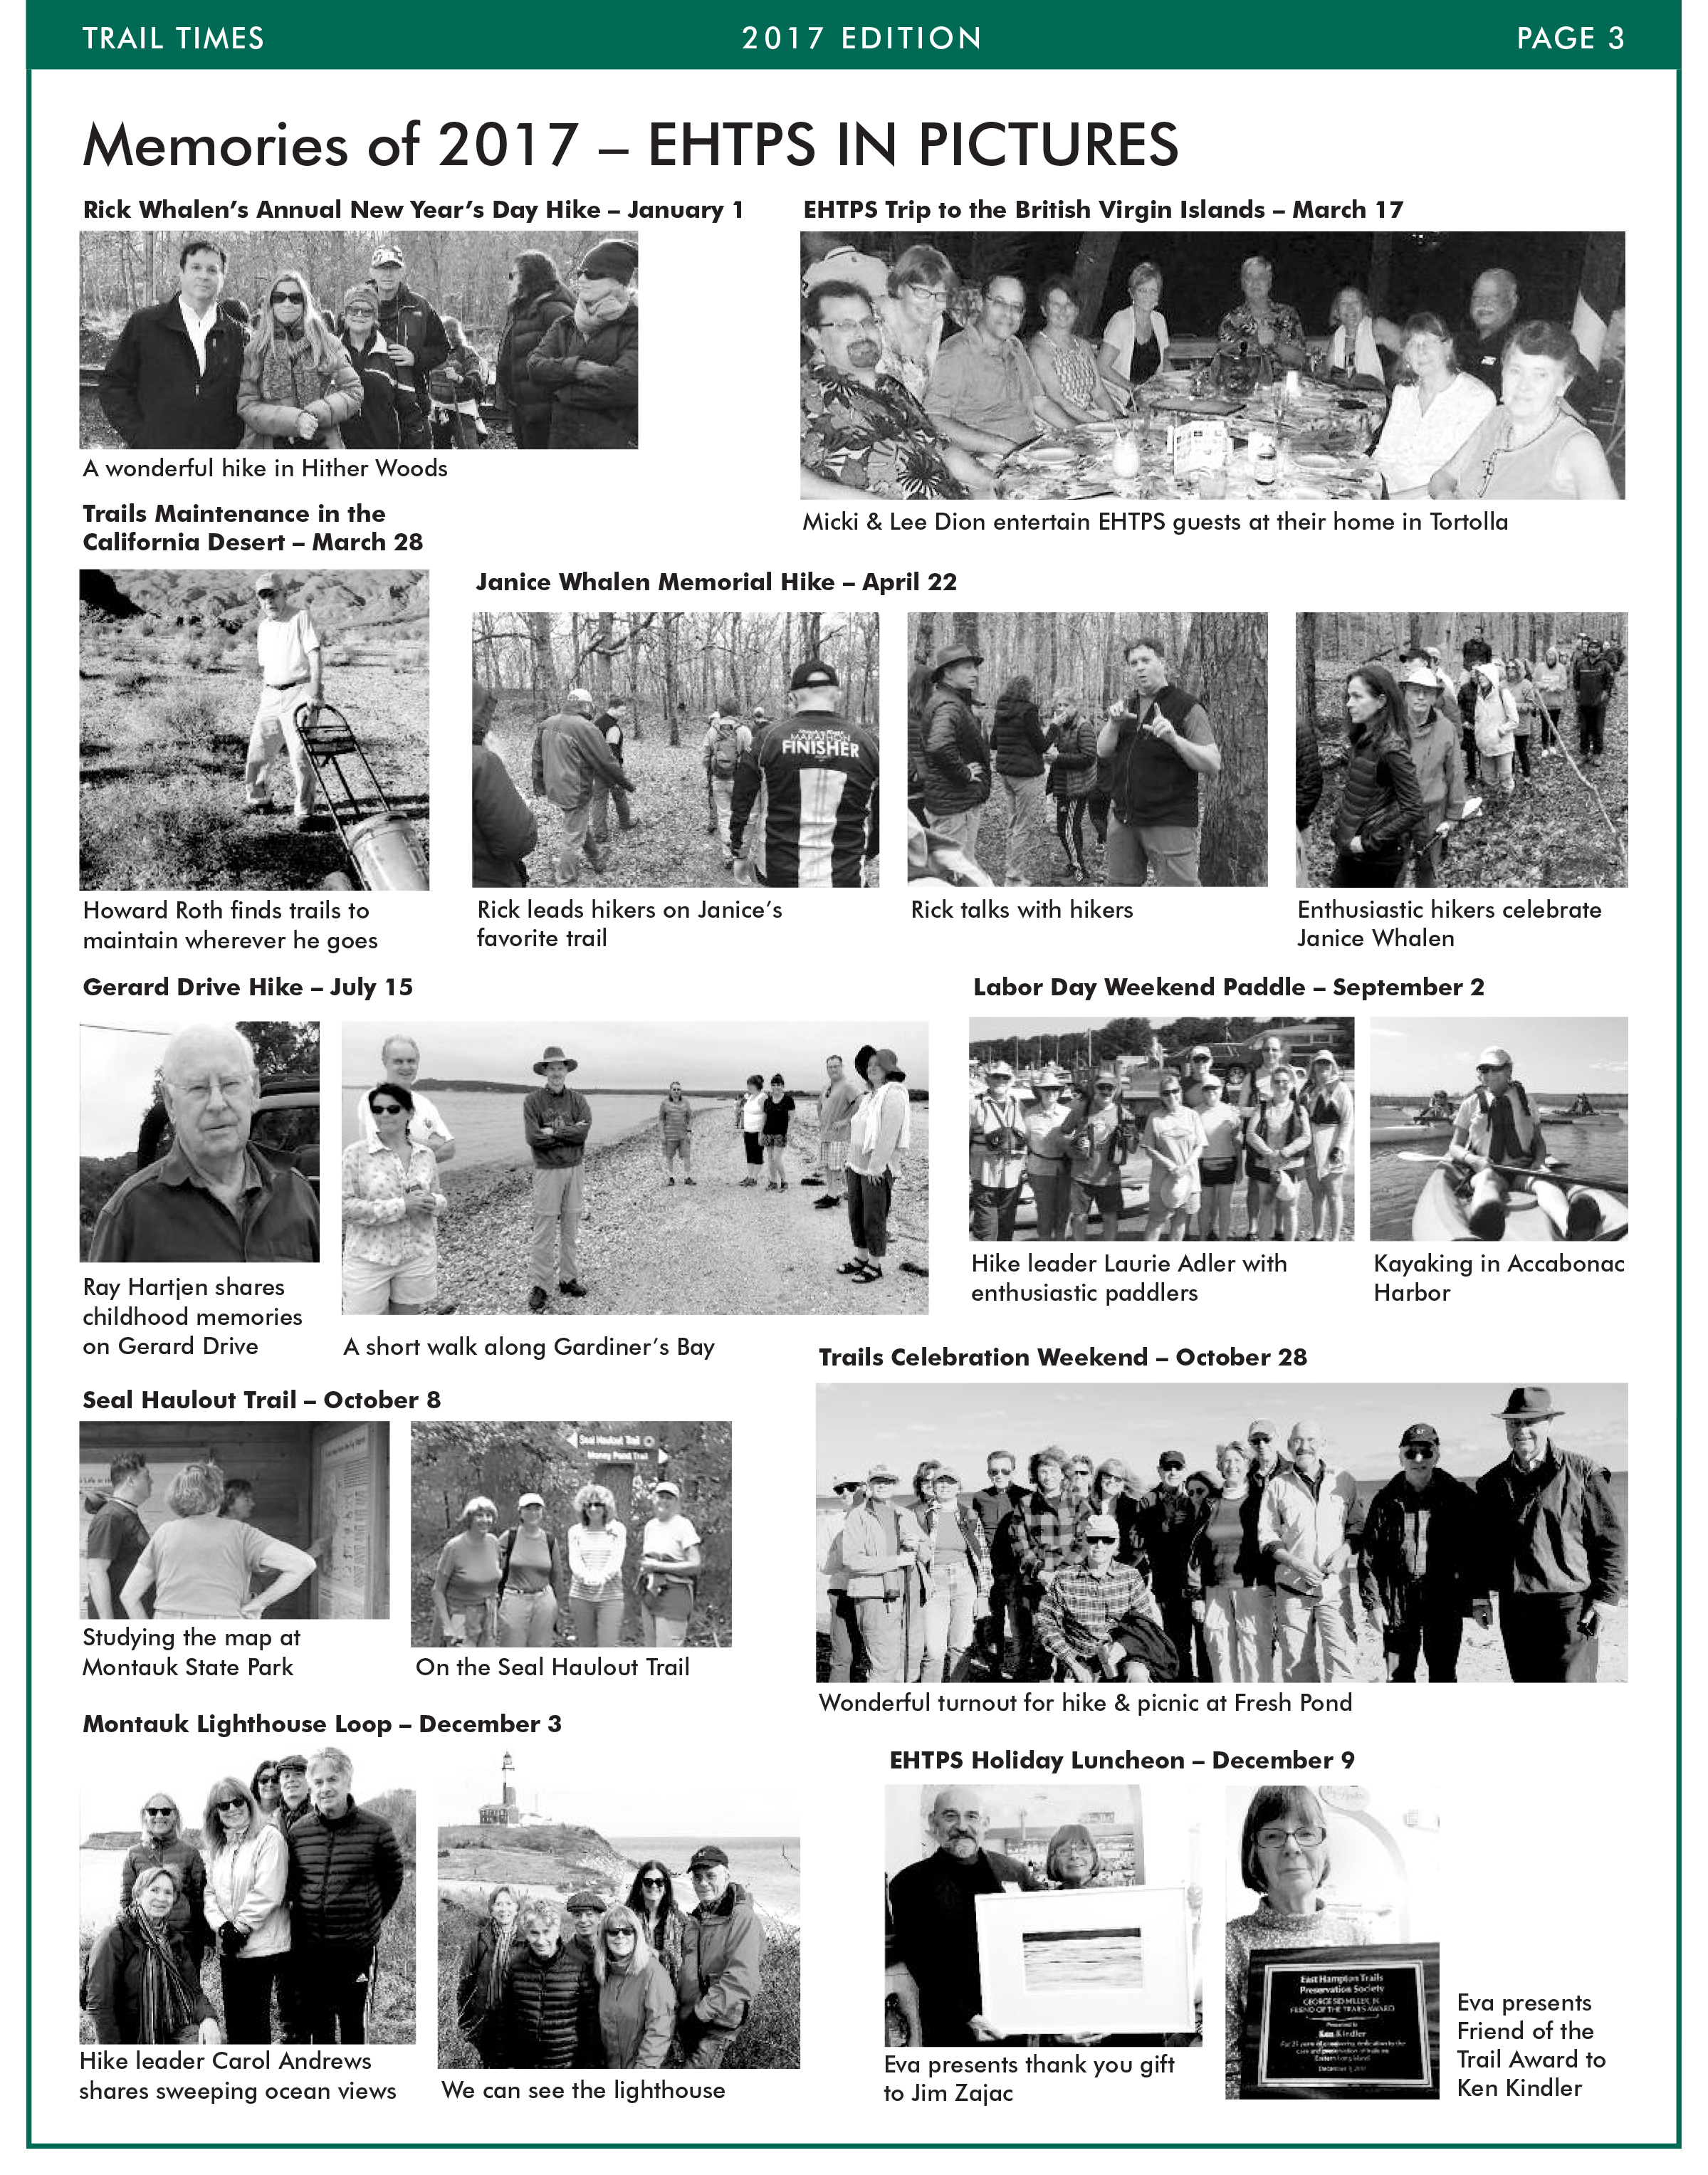 EHTP_Trail_Times_01_2018-3.jpg